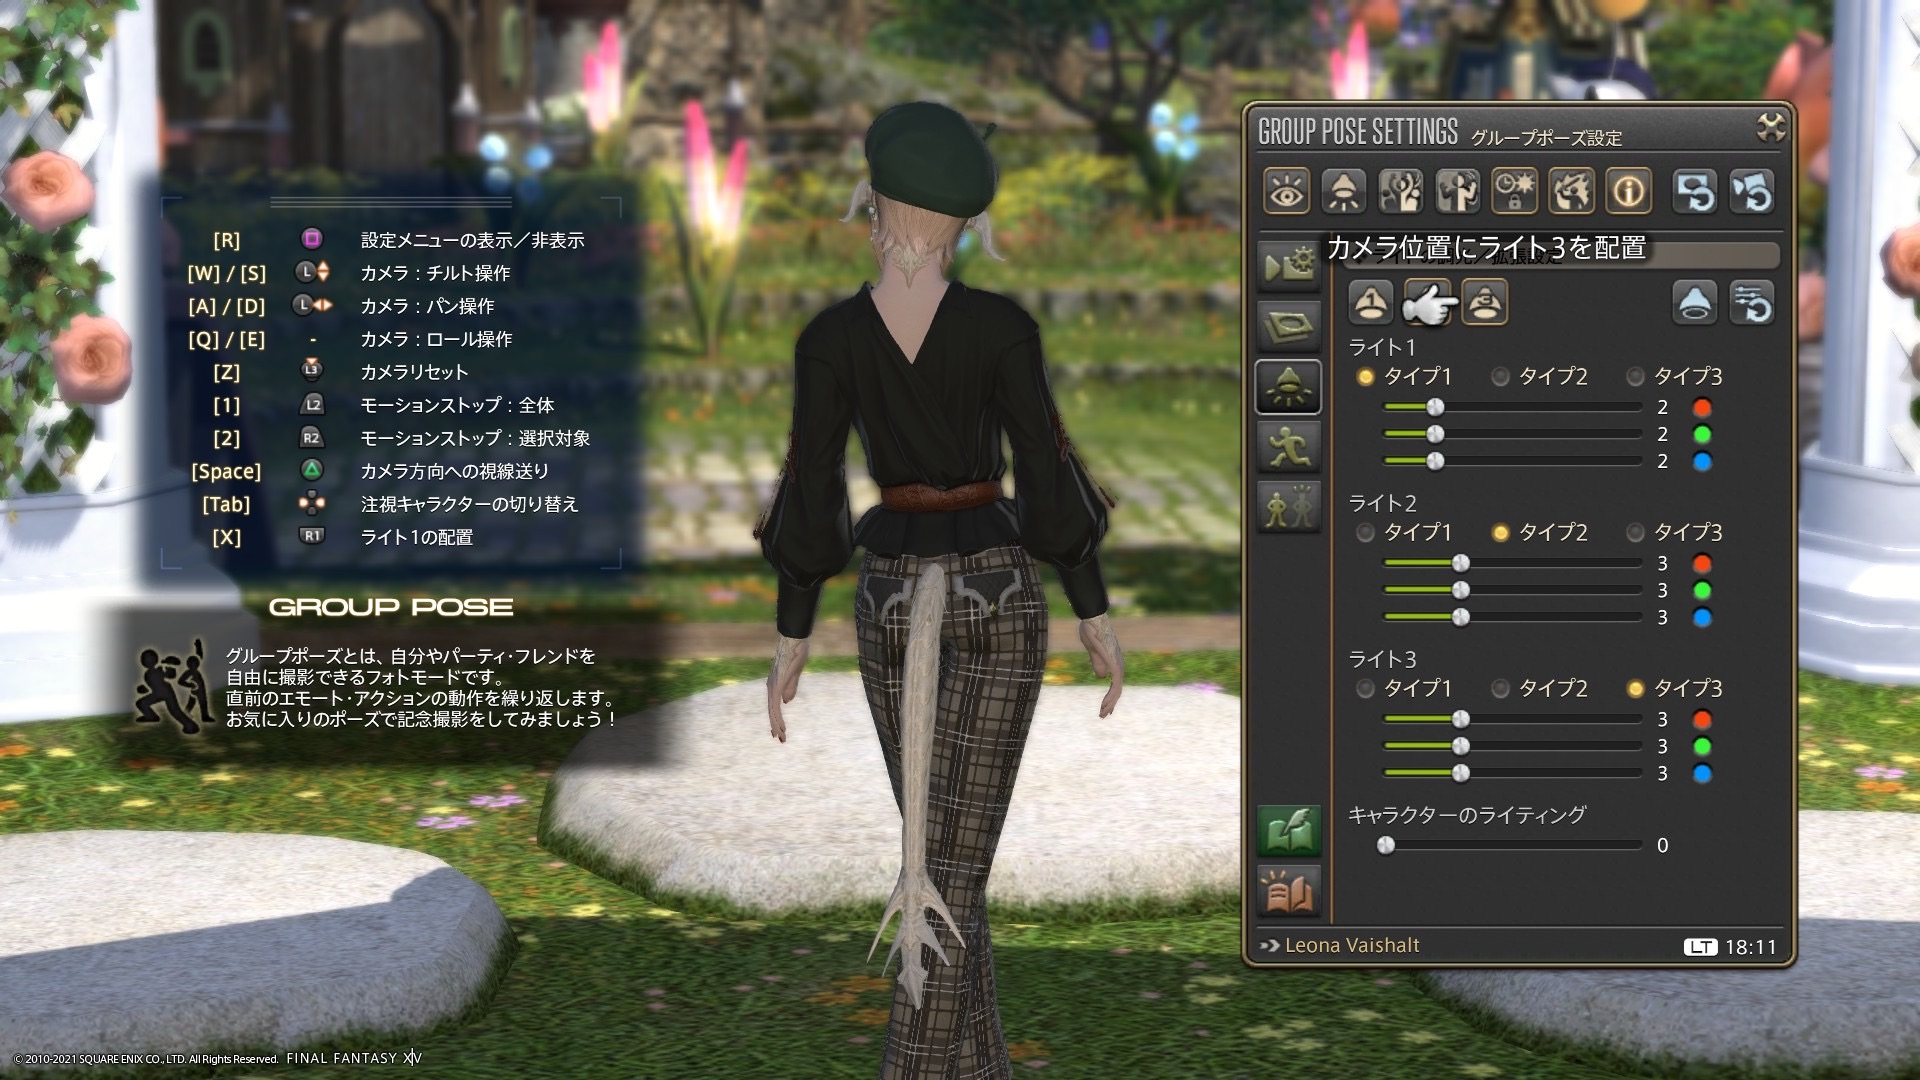 f:id:leonanoblog:20210912181431j:plain